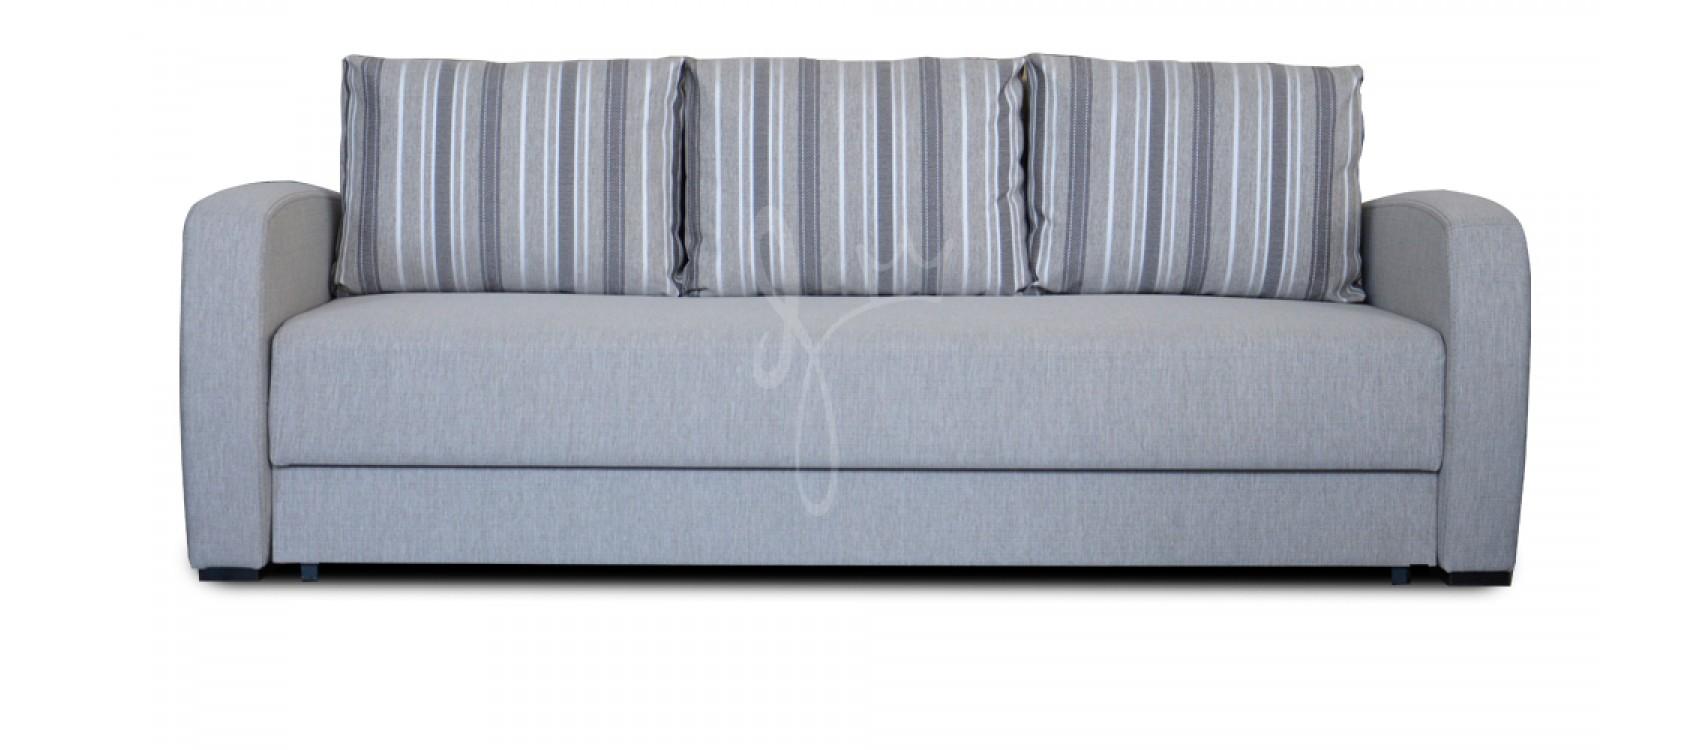 Sofa GOLF foto 1